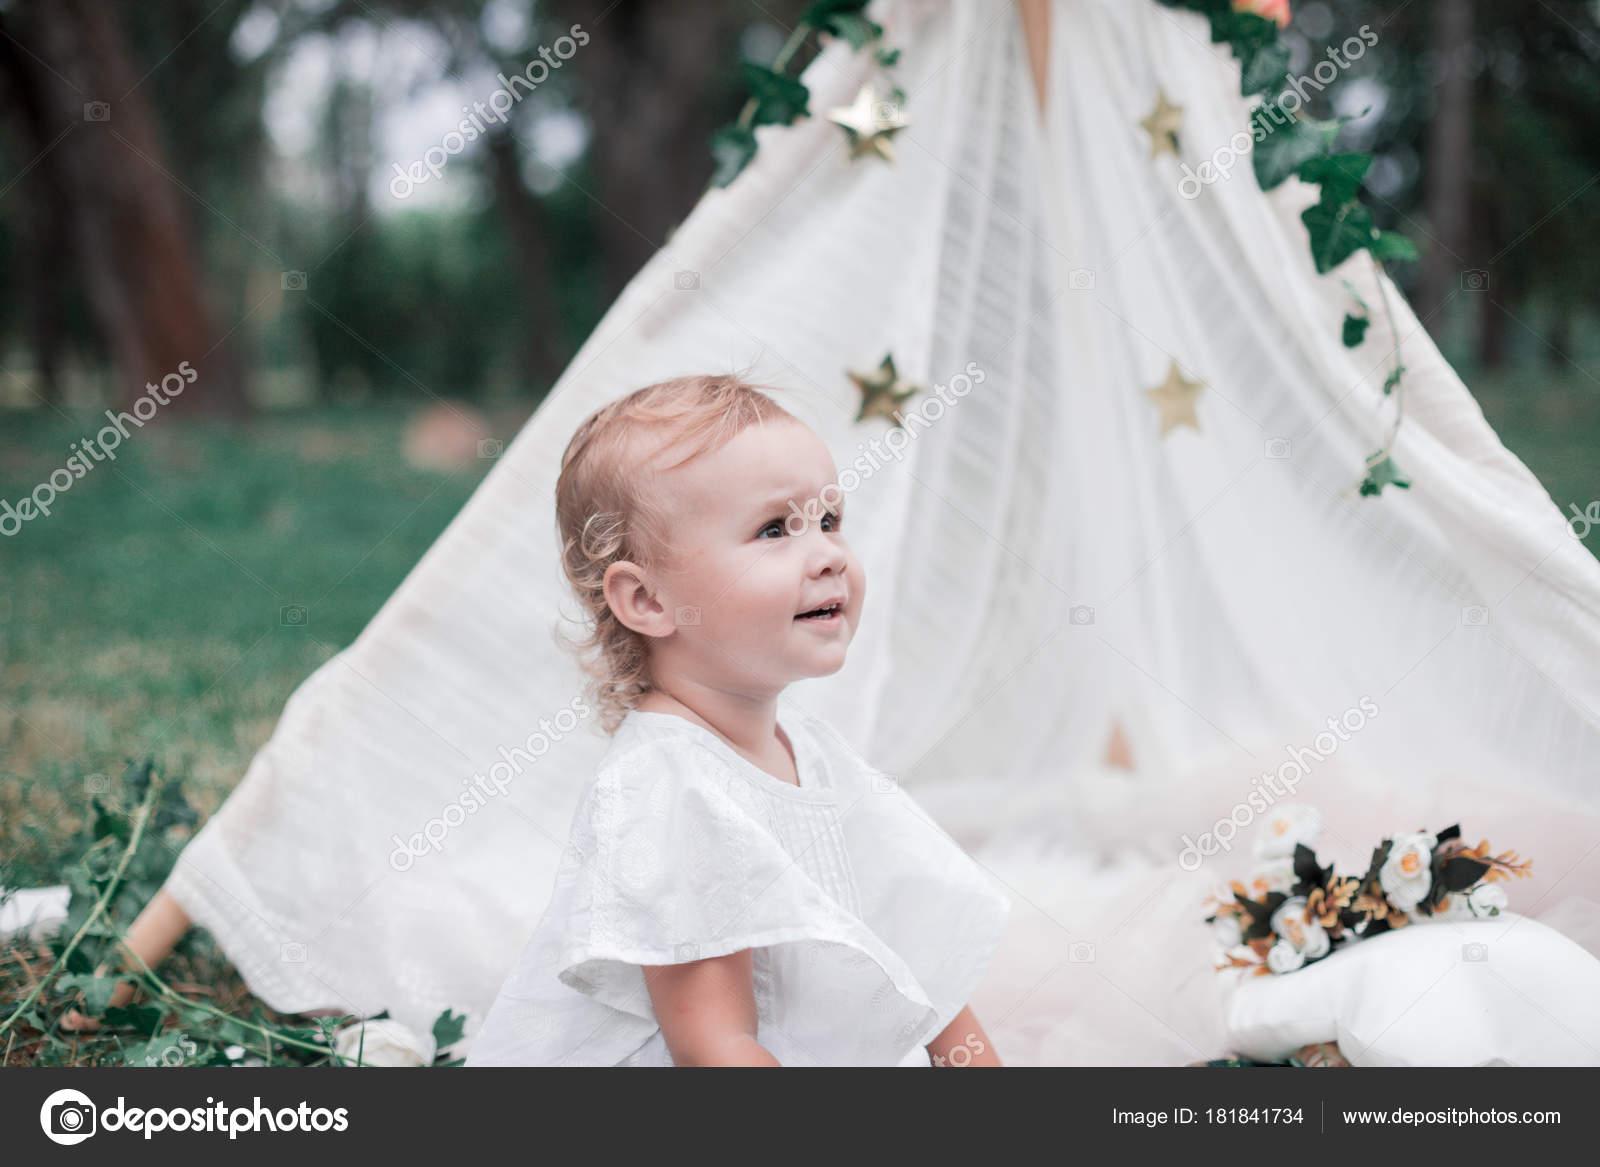 bc006ce174f Baby Girl Celebrating Her Birthday — Stock Photo © margo black ...